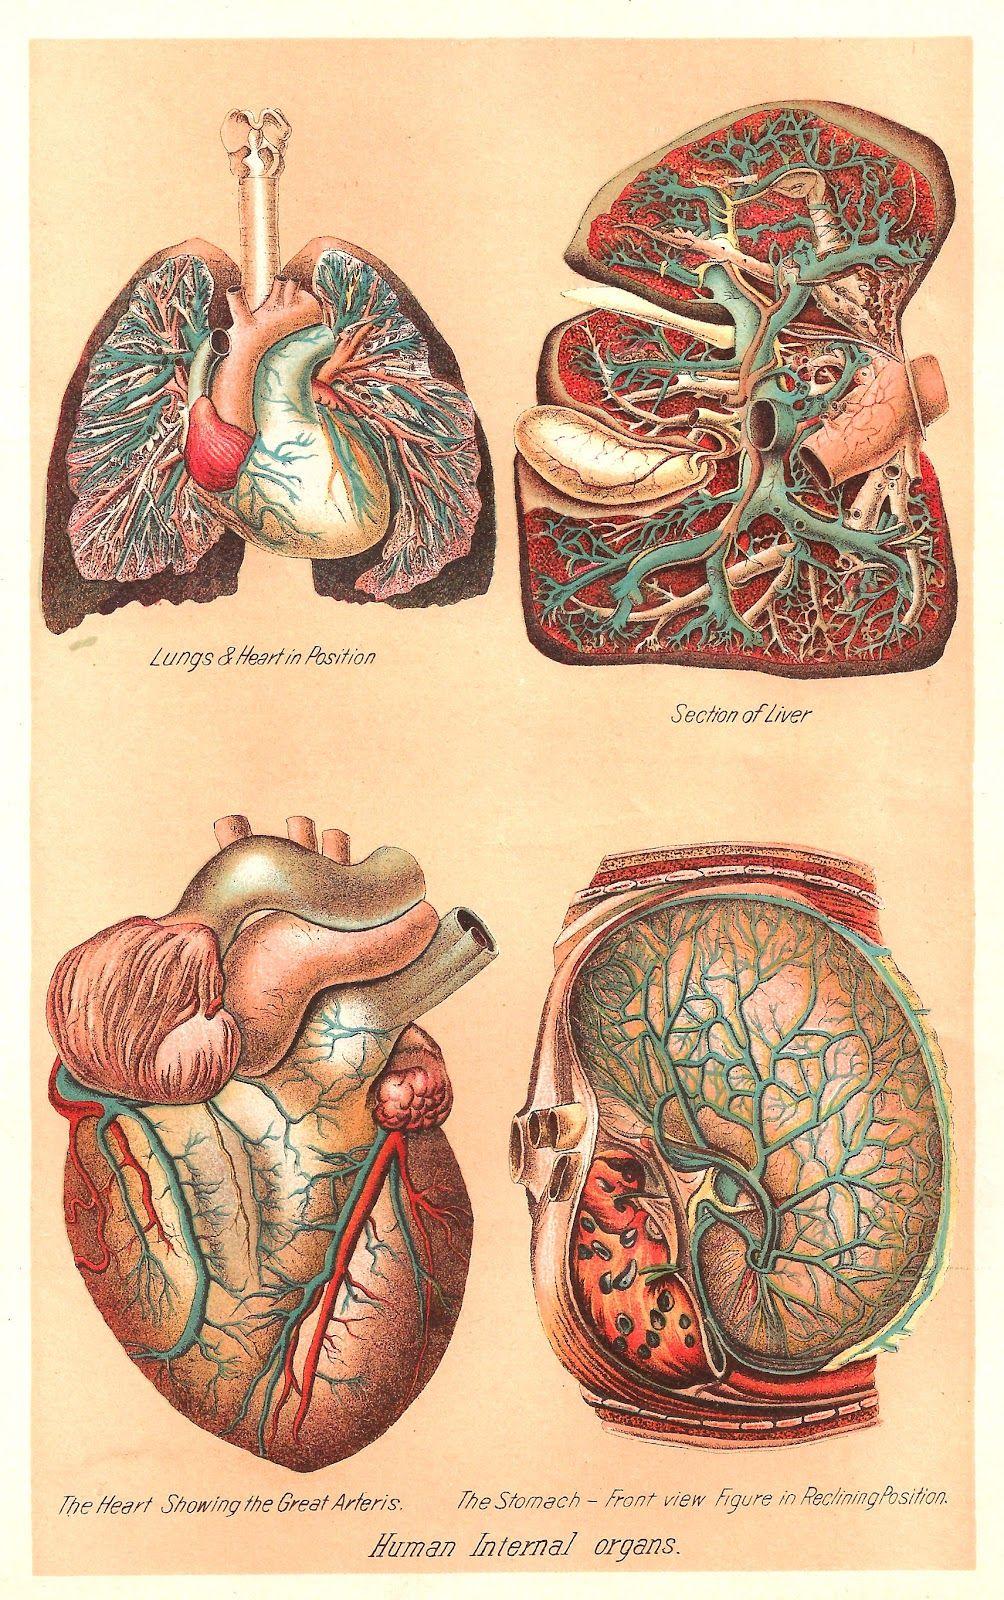 15 Free Vintage Medical Halloween Images Remodelaholic